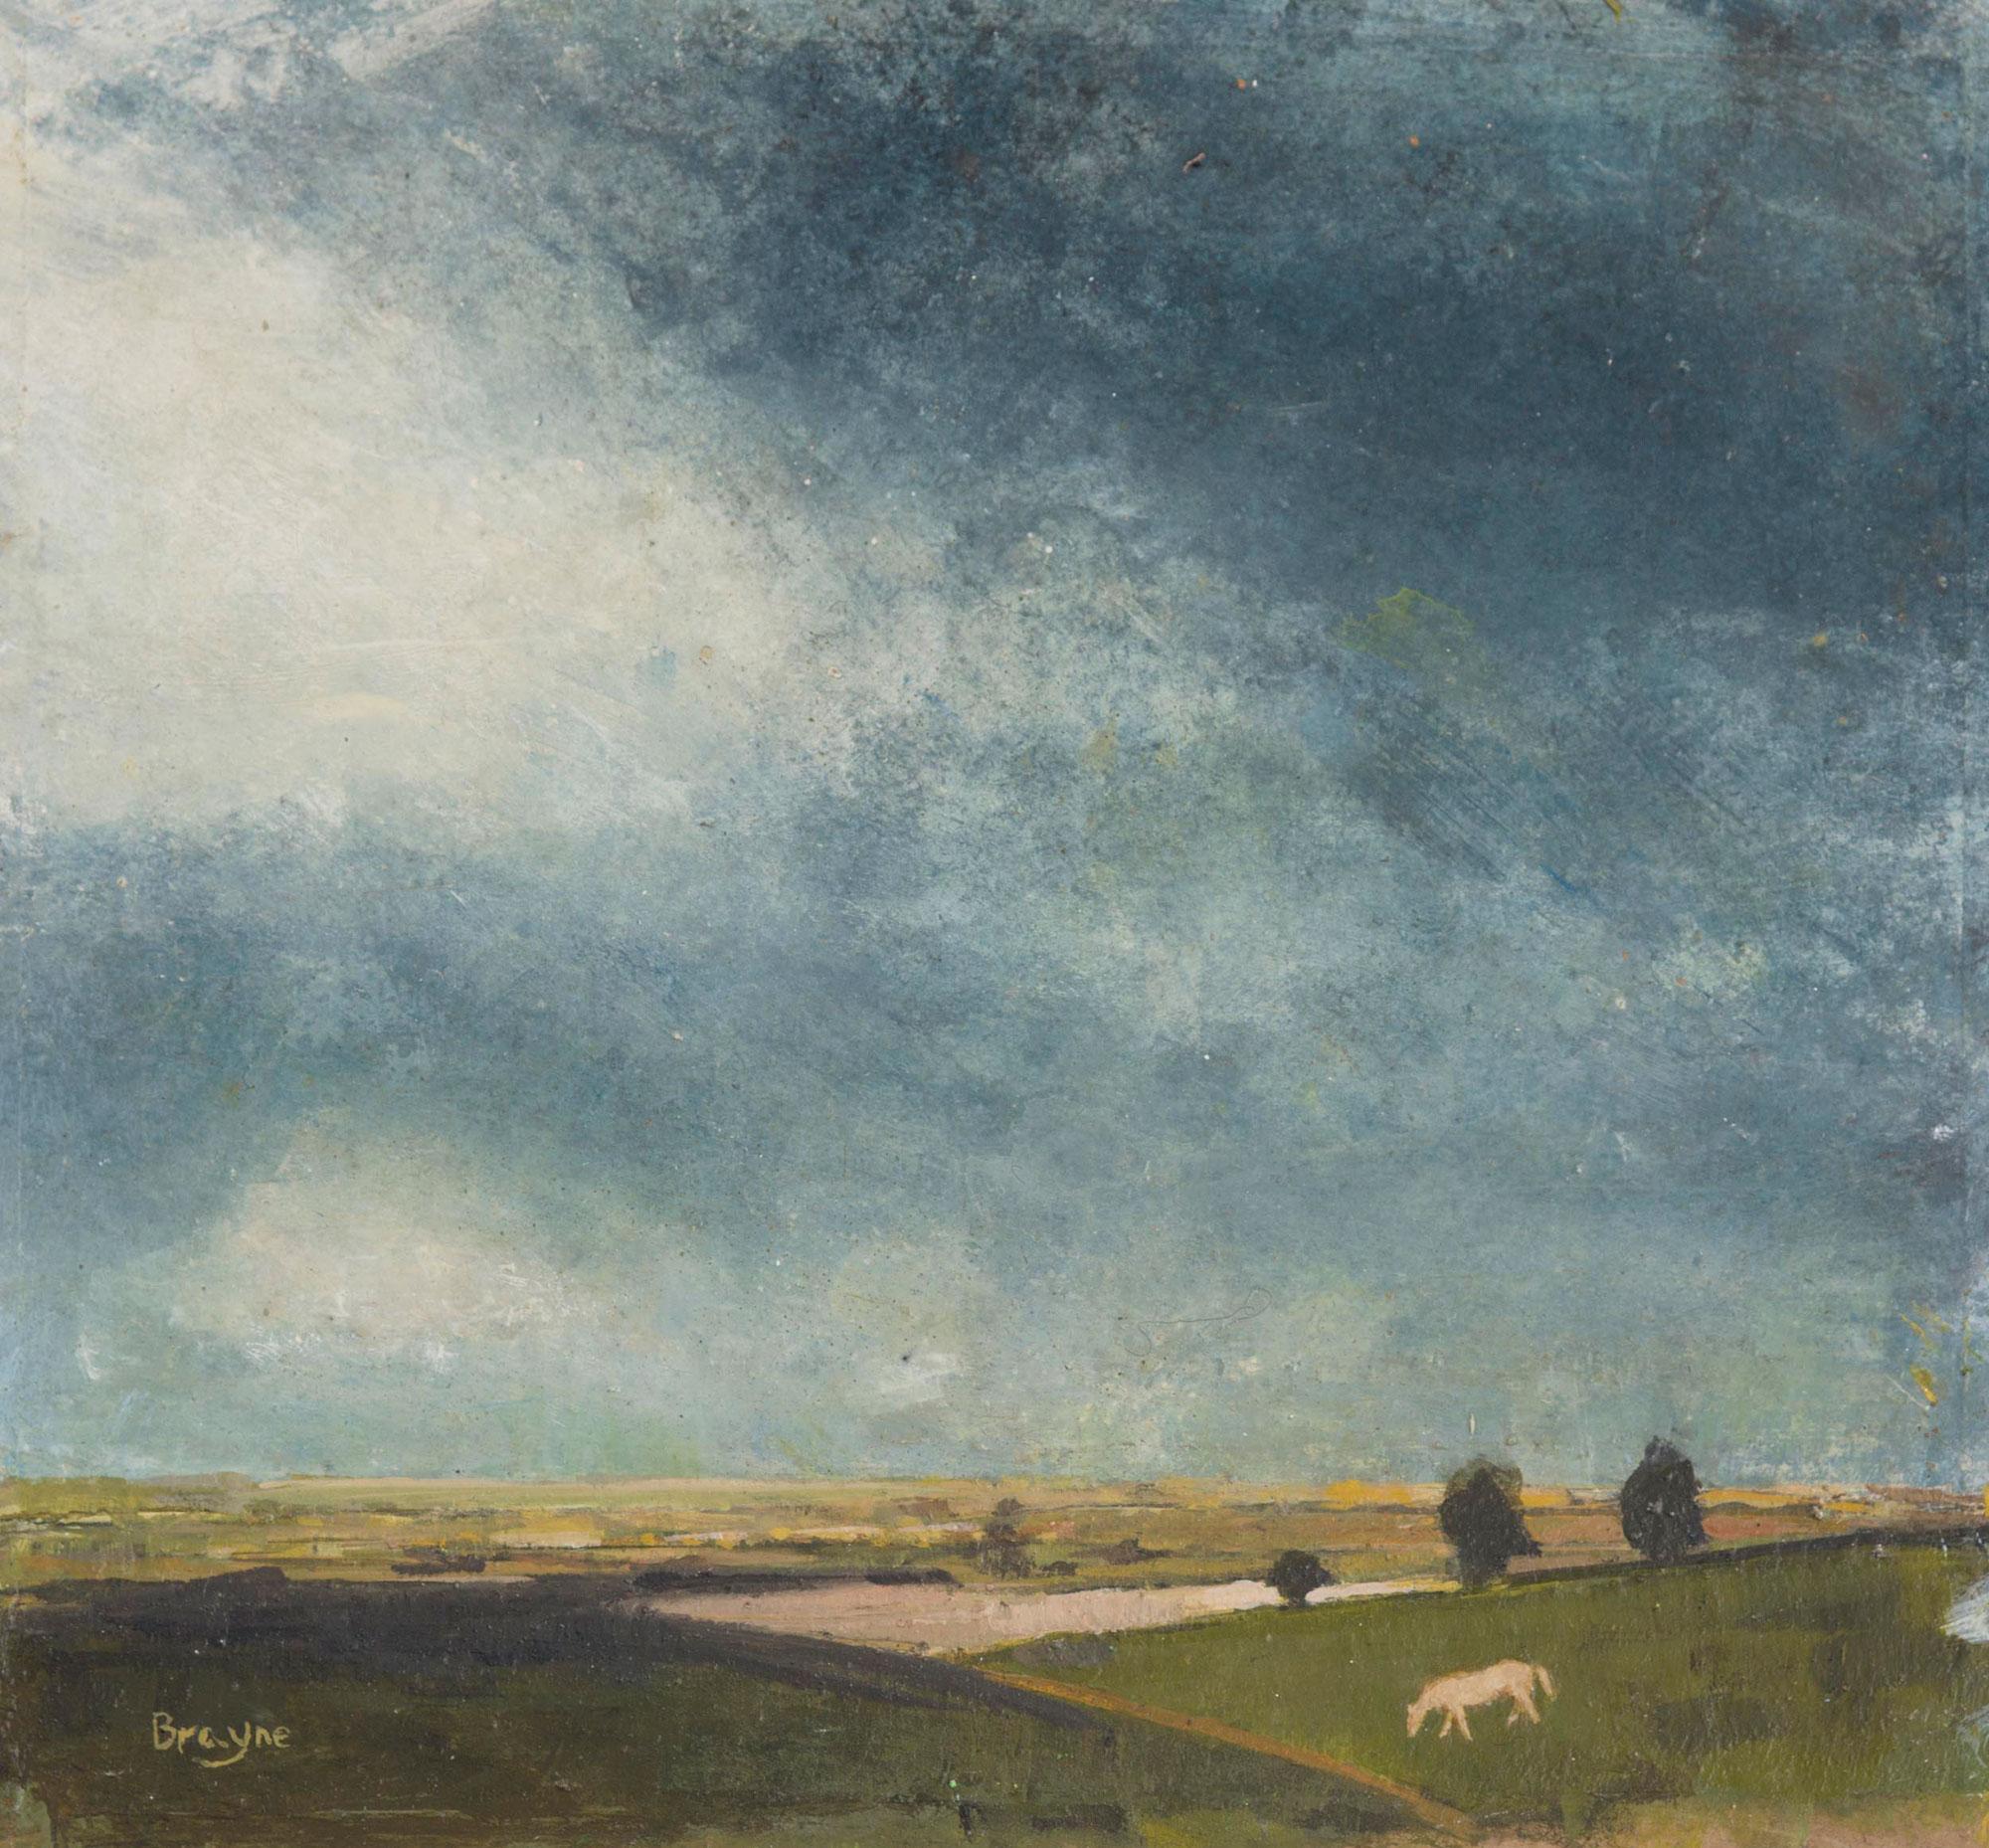 Grey Horse by David Brayne RWS